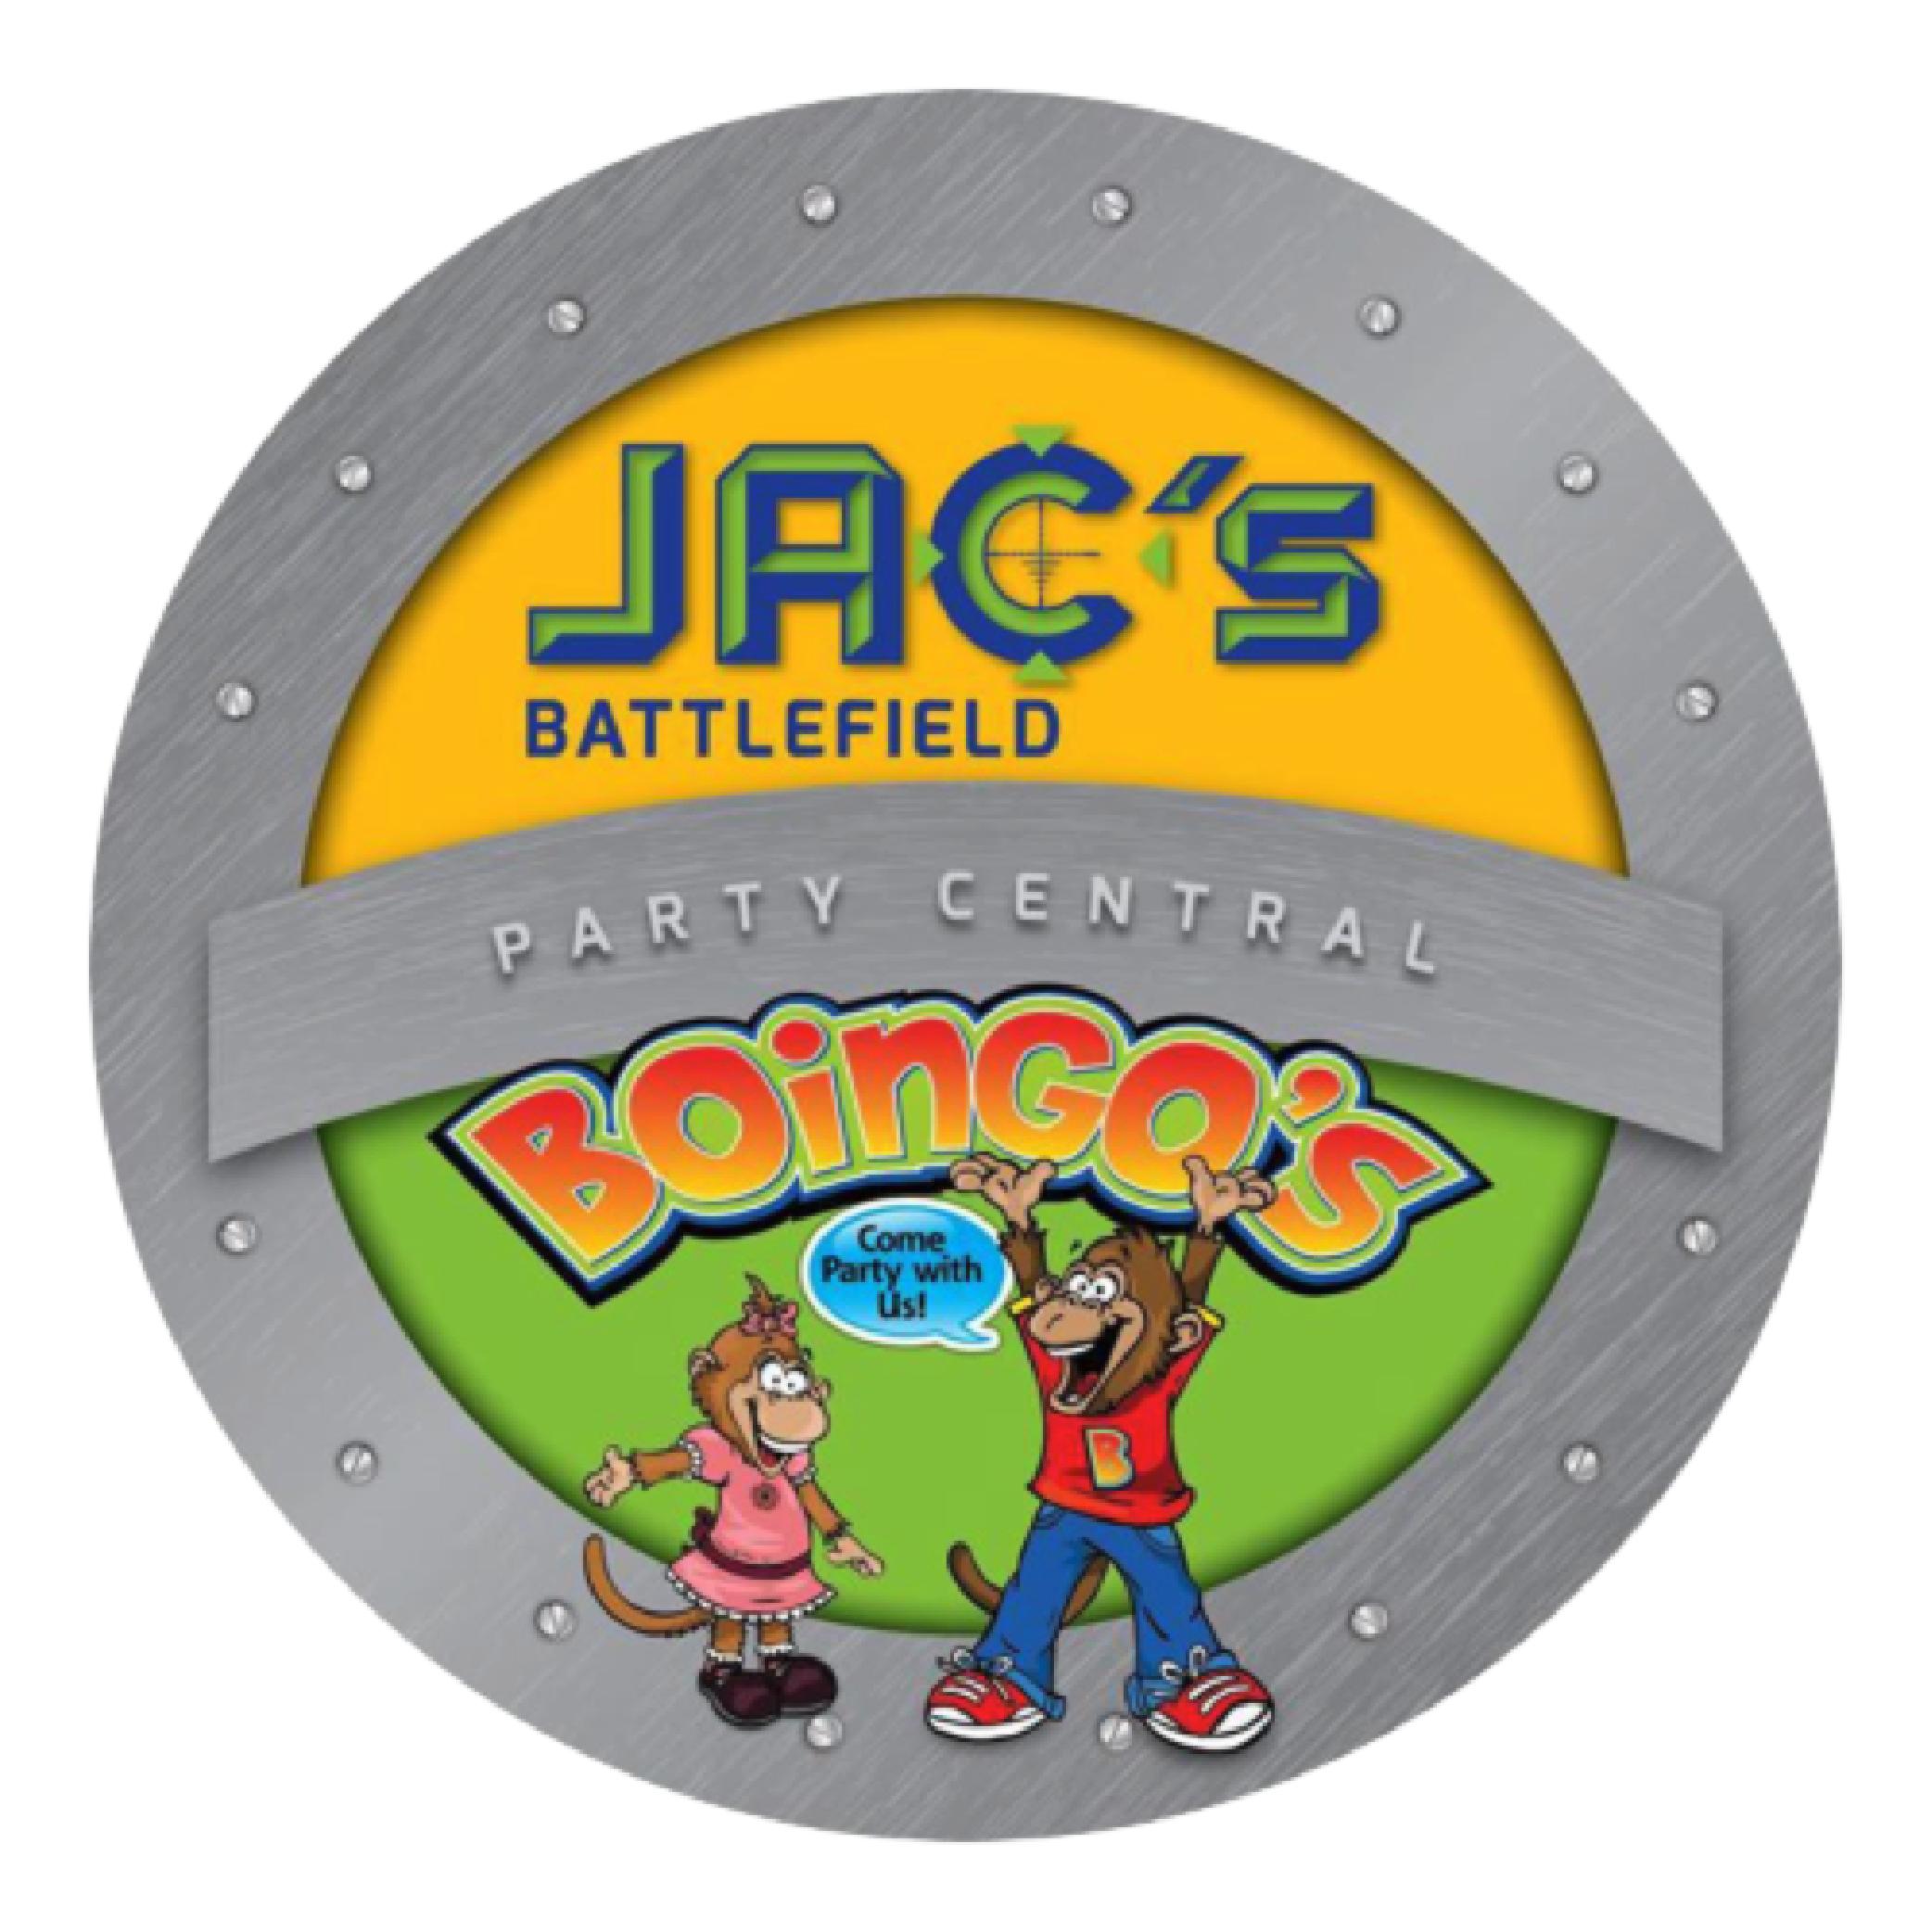 Boingo's Bounce House & Jac's Battlefield